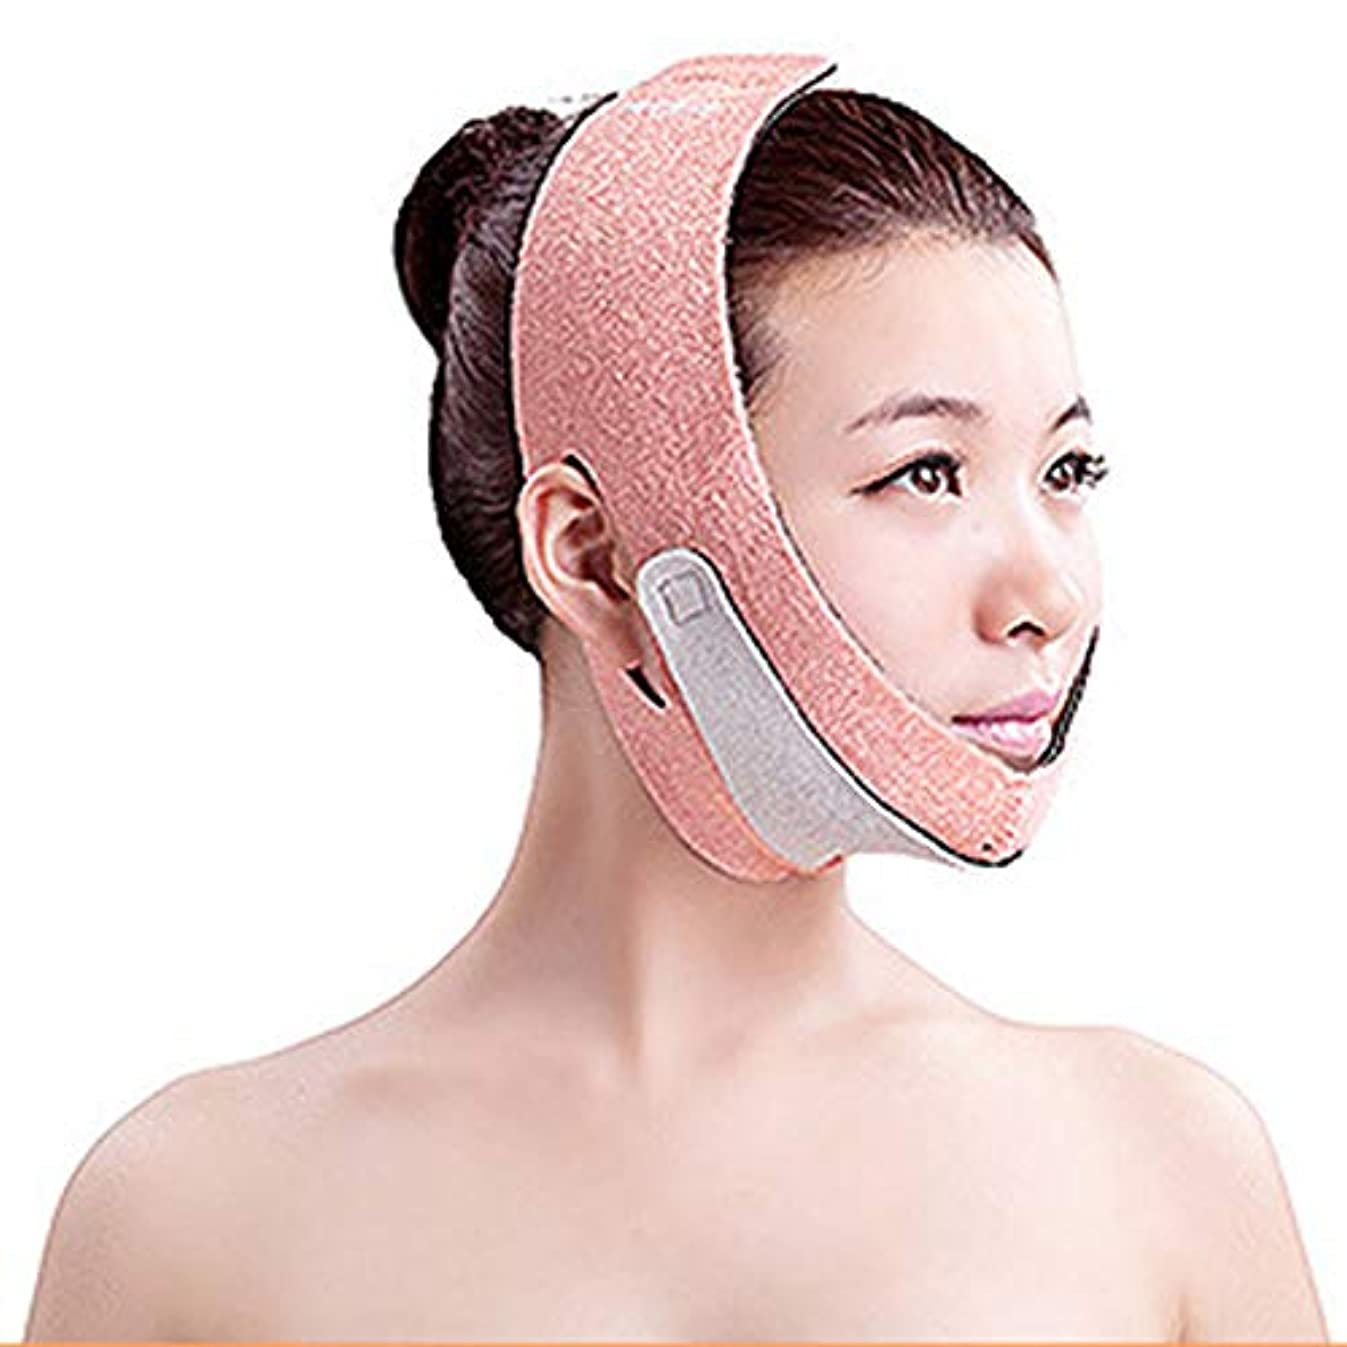 V顔の強力な持ち上げツール、修正3D改装リフティング包帯二重あごの女性の抗しわの美しさフェイスリフティングアーティファクト睡眠包帯薄い顔二重あご無料呼吸,Orange